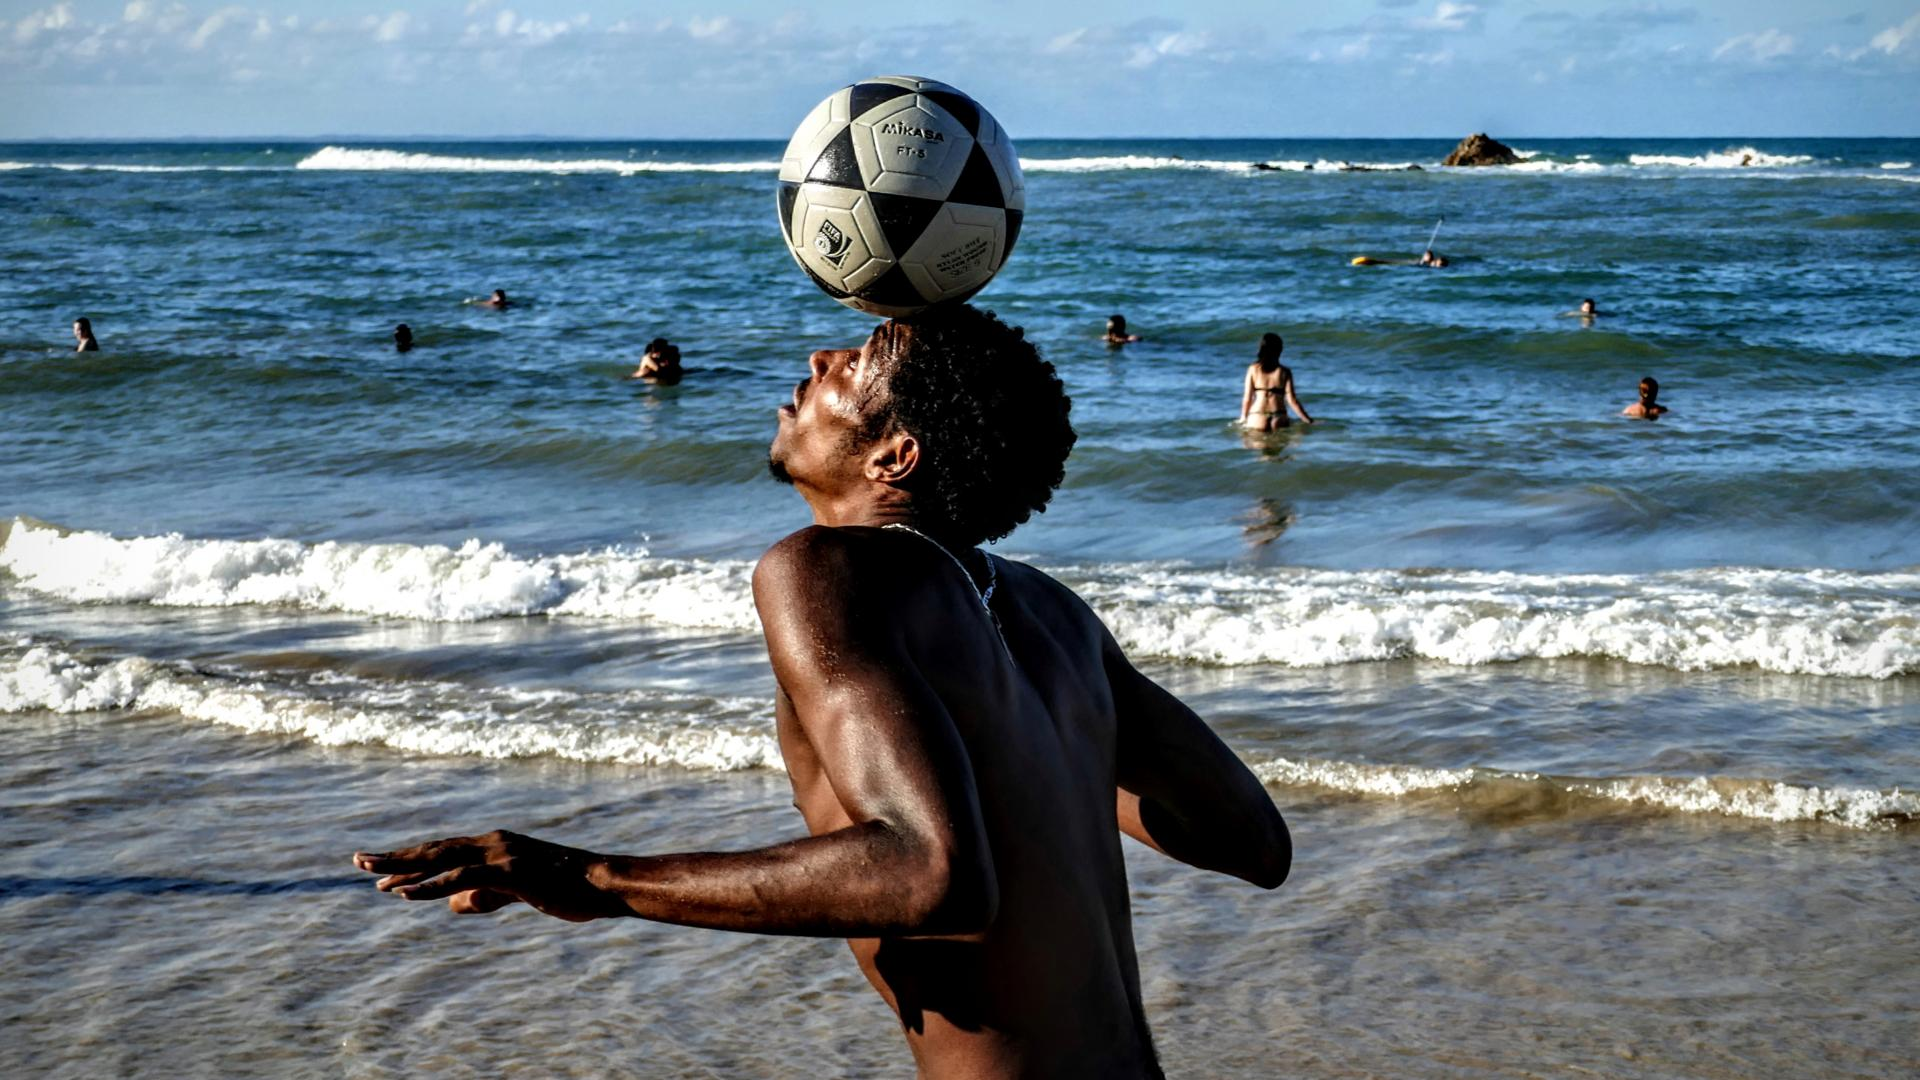 Fußballer am Strand in Brasilien